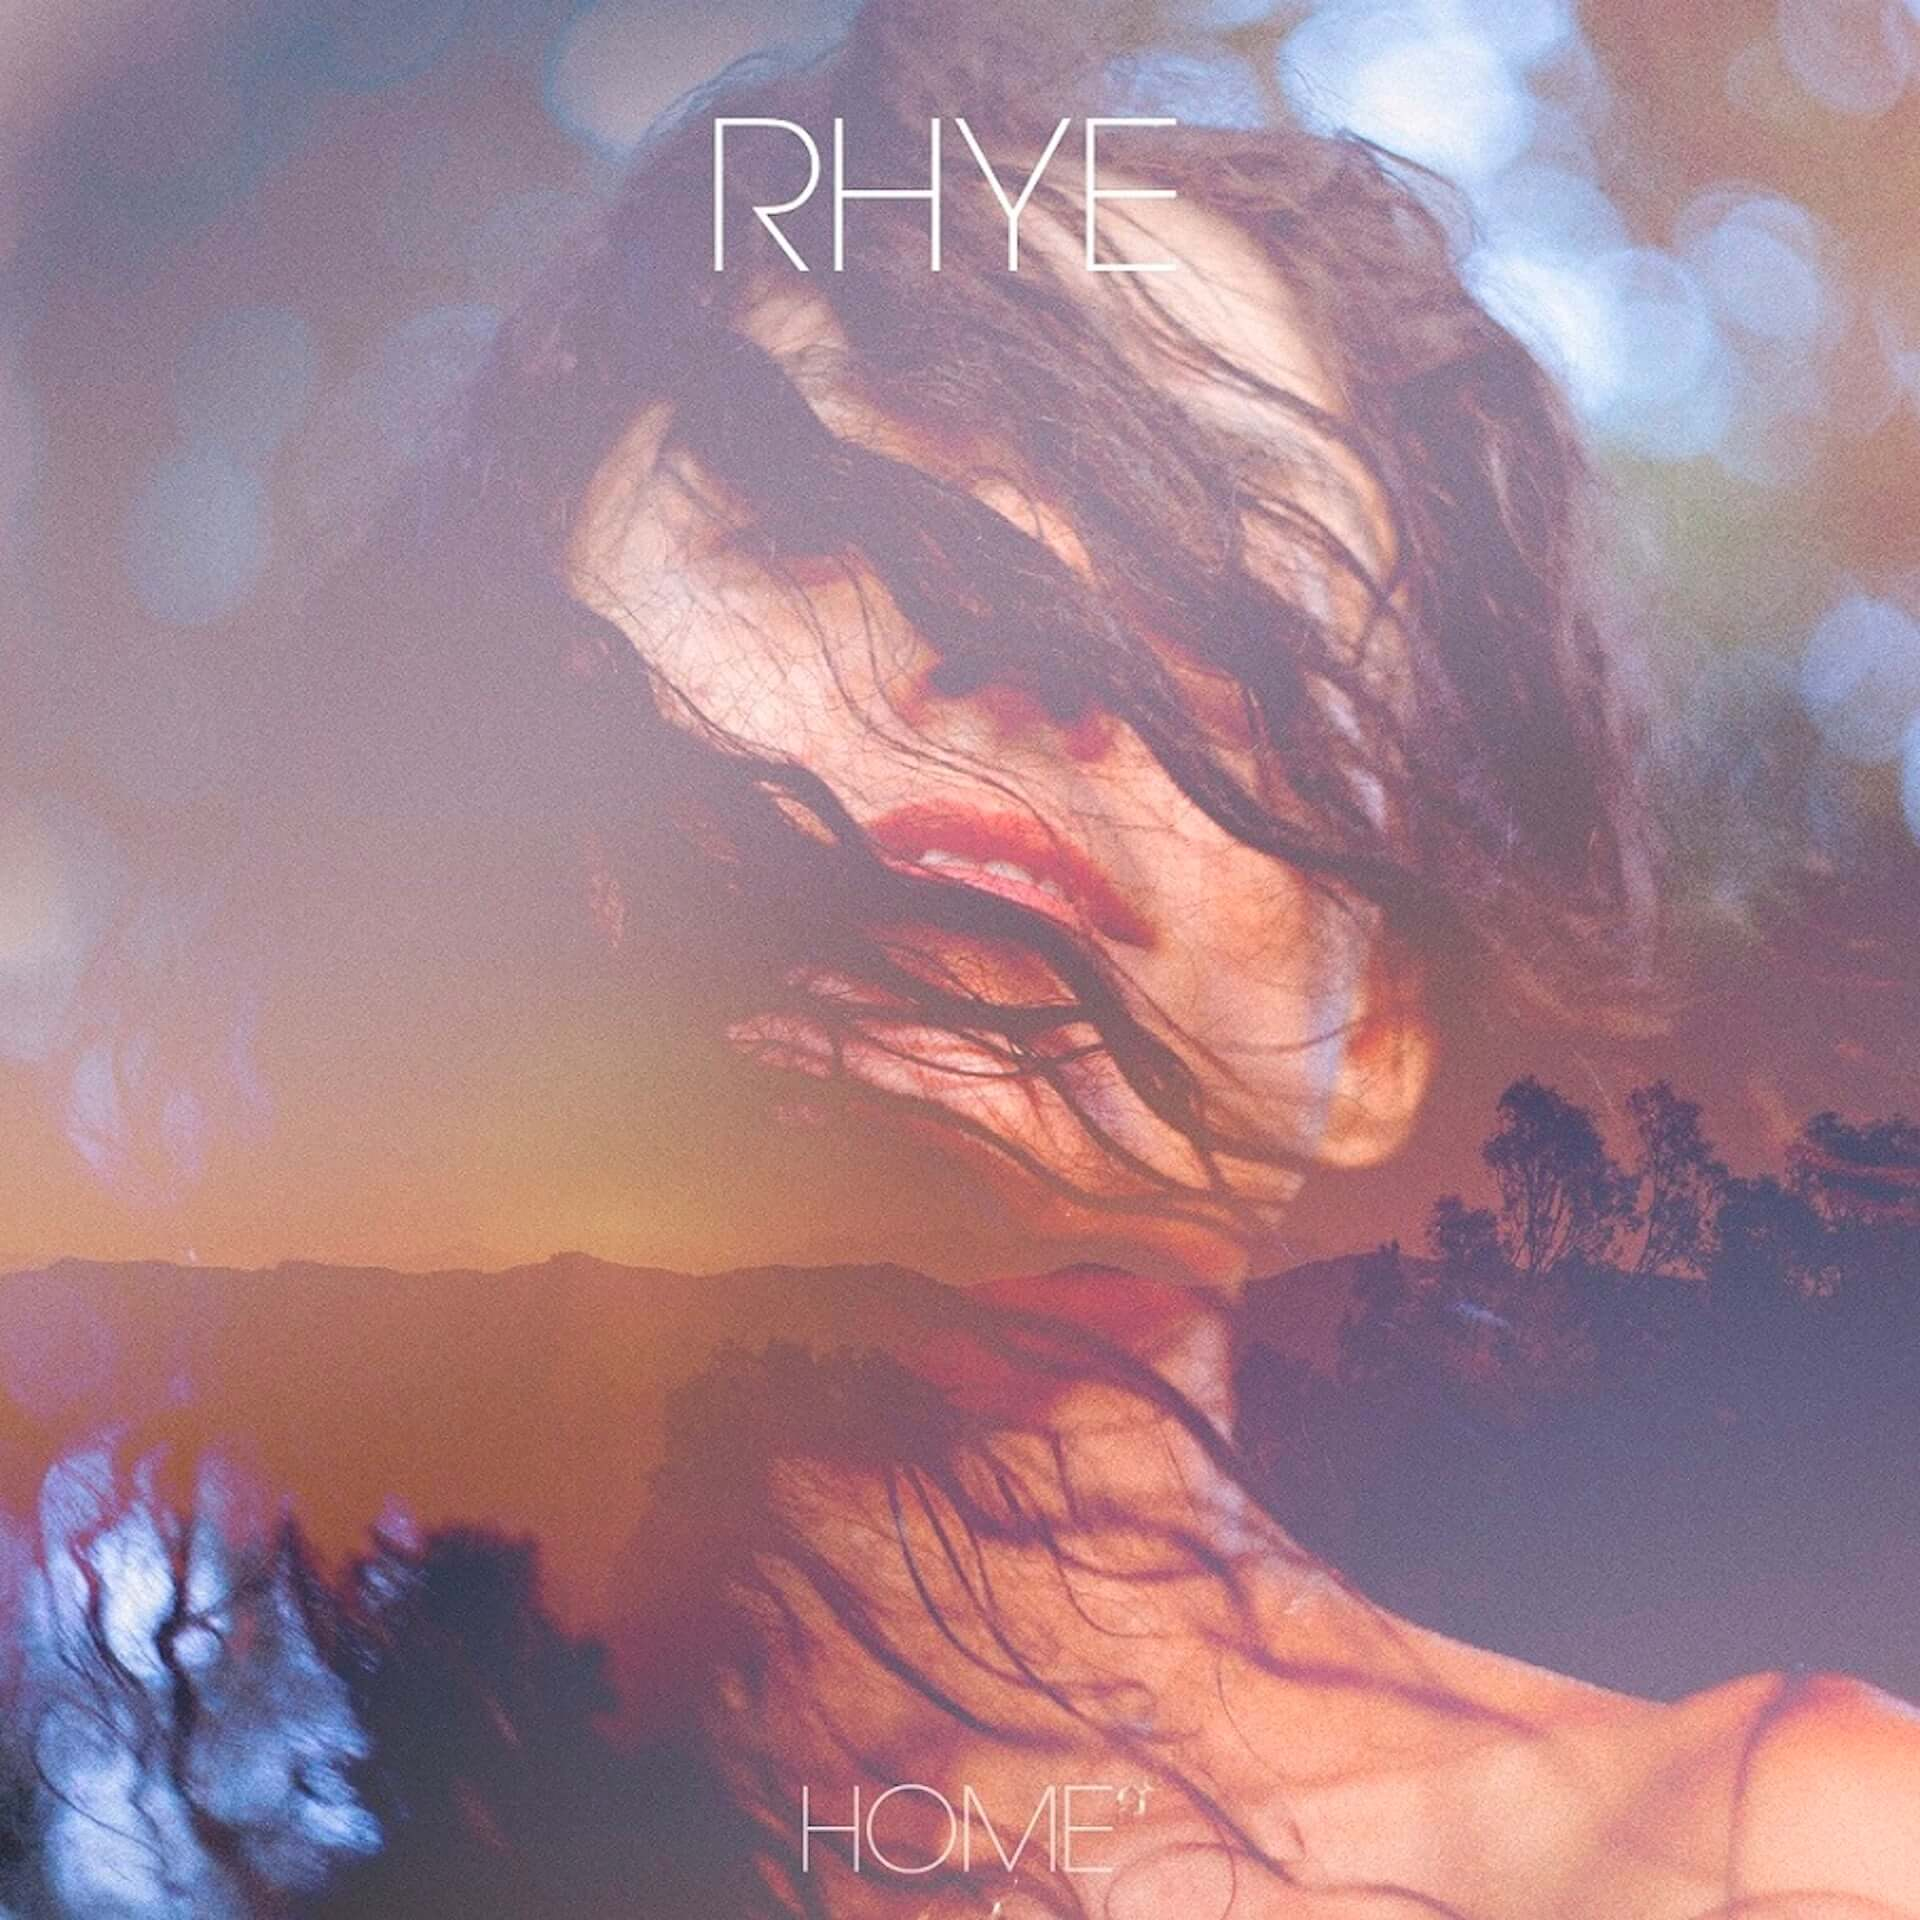 "Rhye最新作『Home』より収録曲""Come In Closer""の音源&MVが公開!新アルバムの日本盤情報も解禁 music210112_rhye_2-1920x1920"